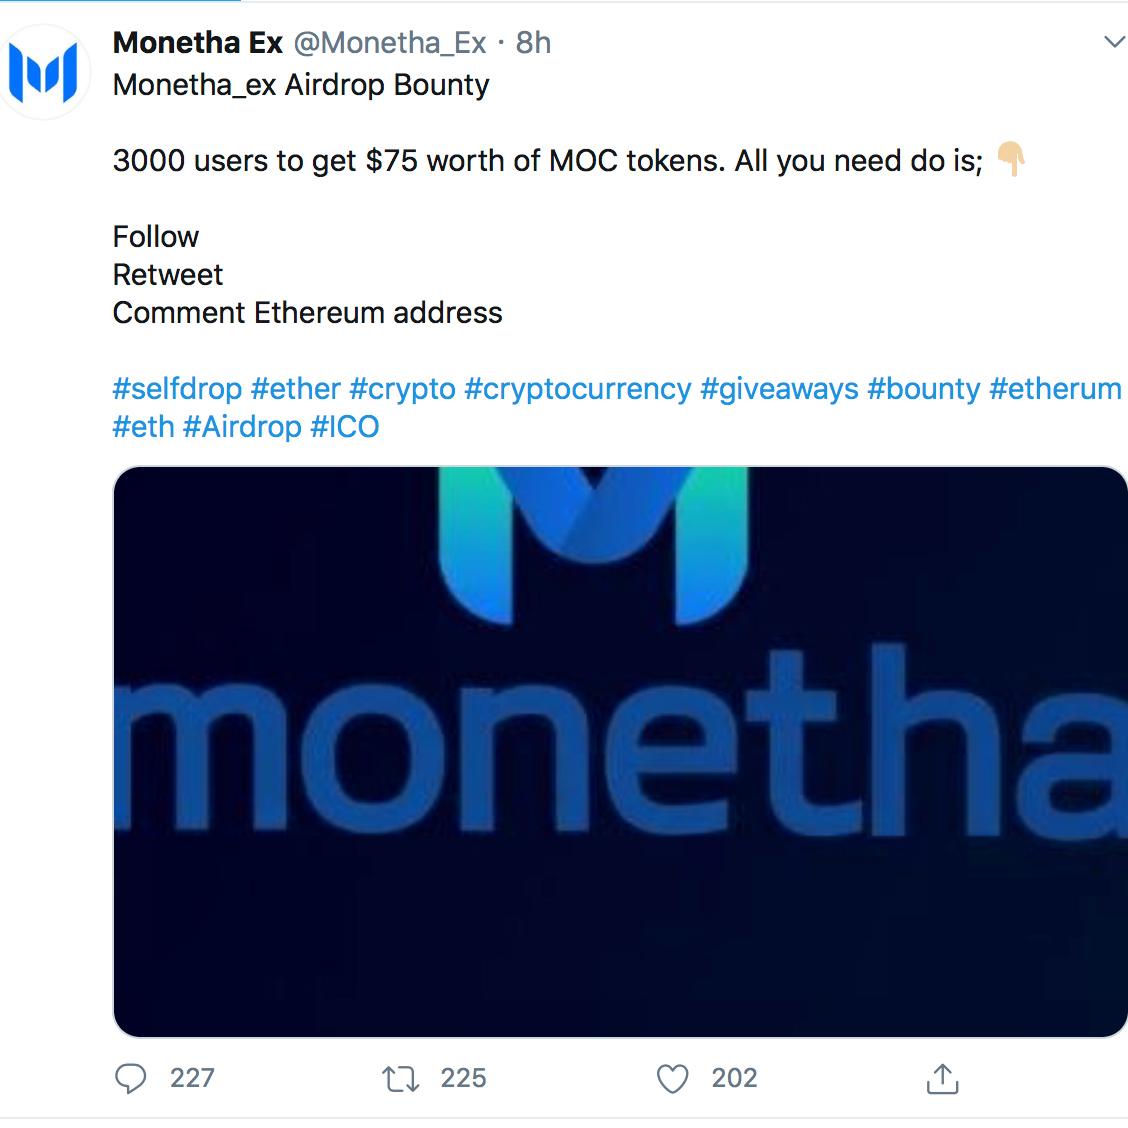 monetha cryptocurrency price